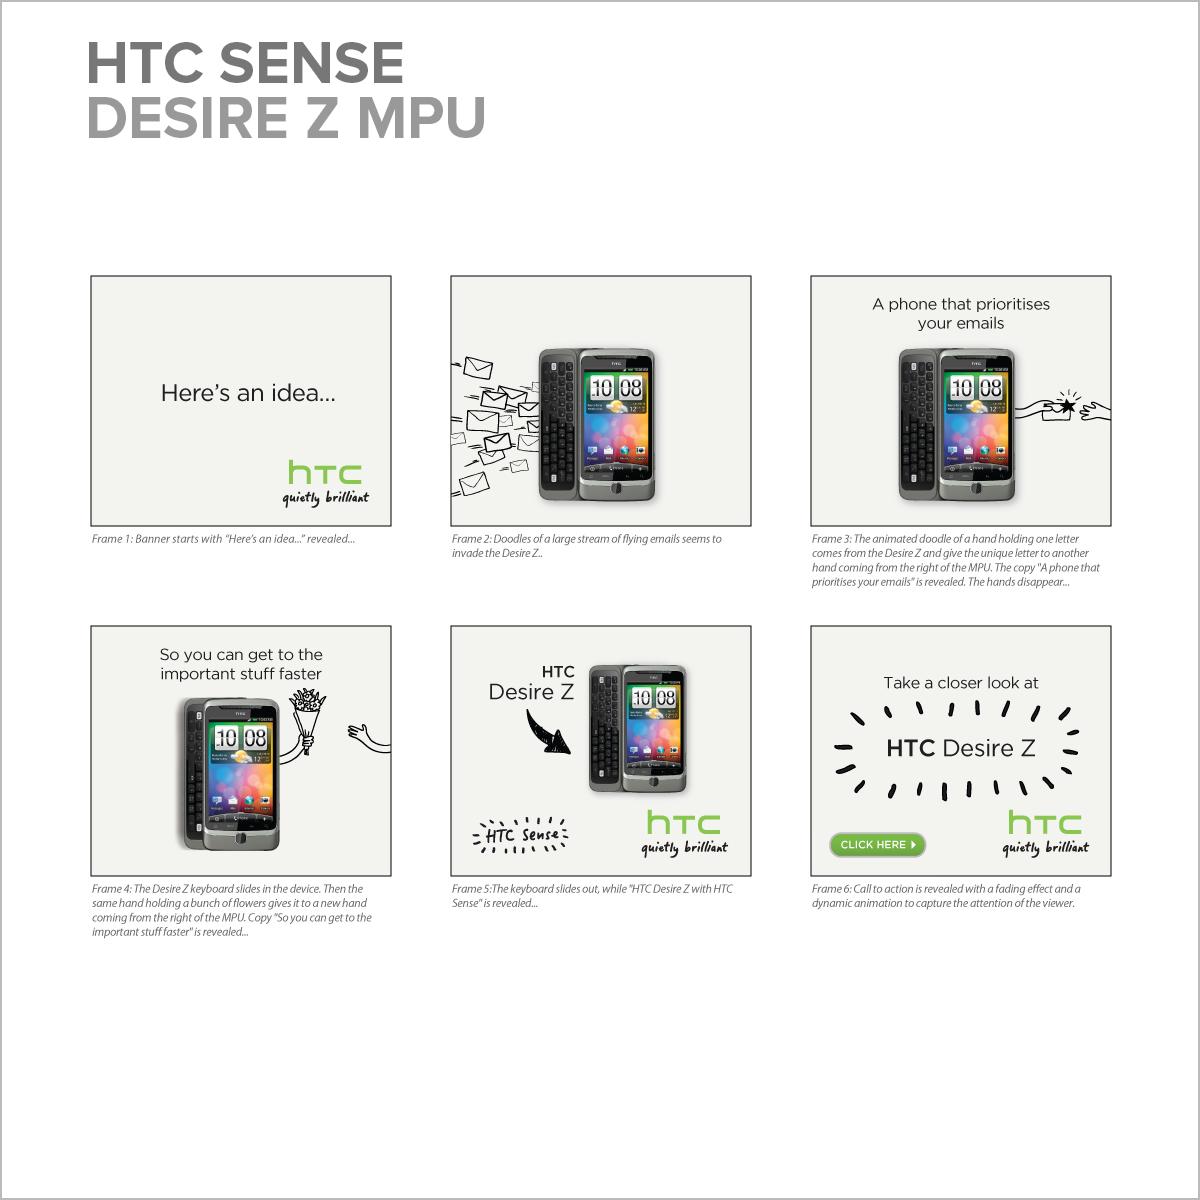 HTC-Sense-Storyboard-1.png